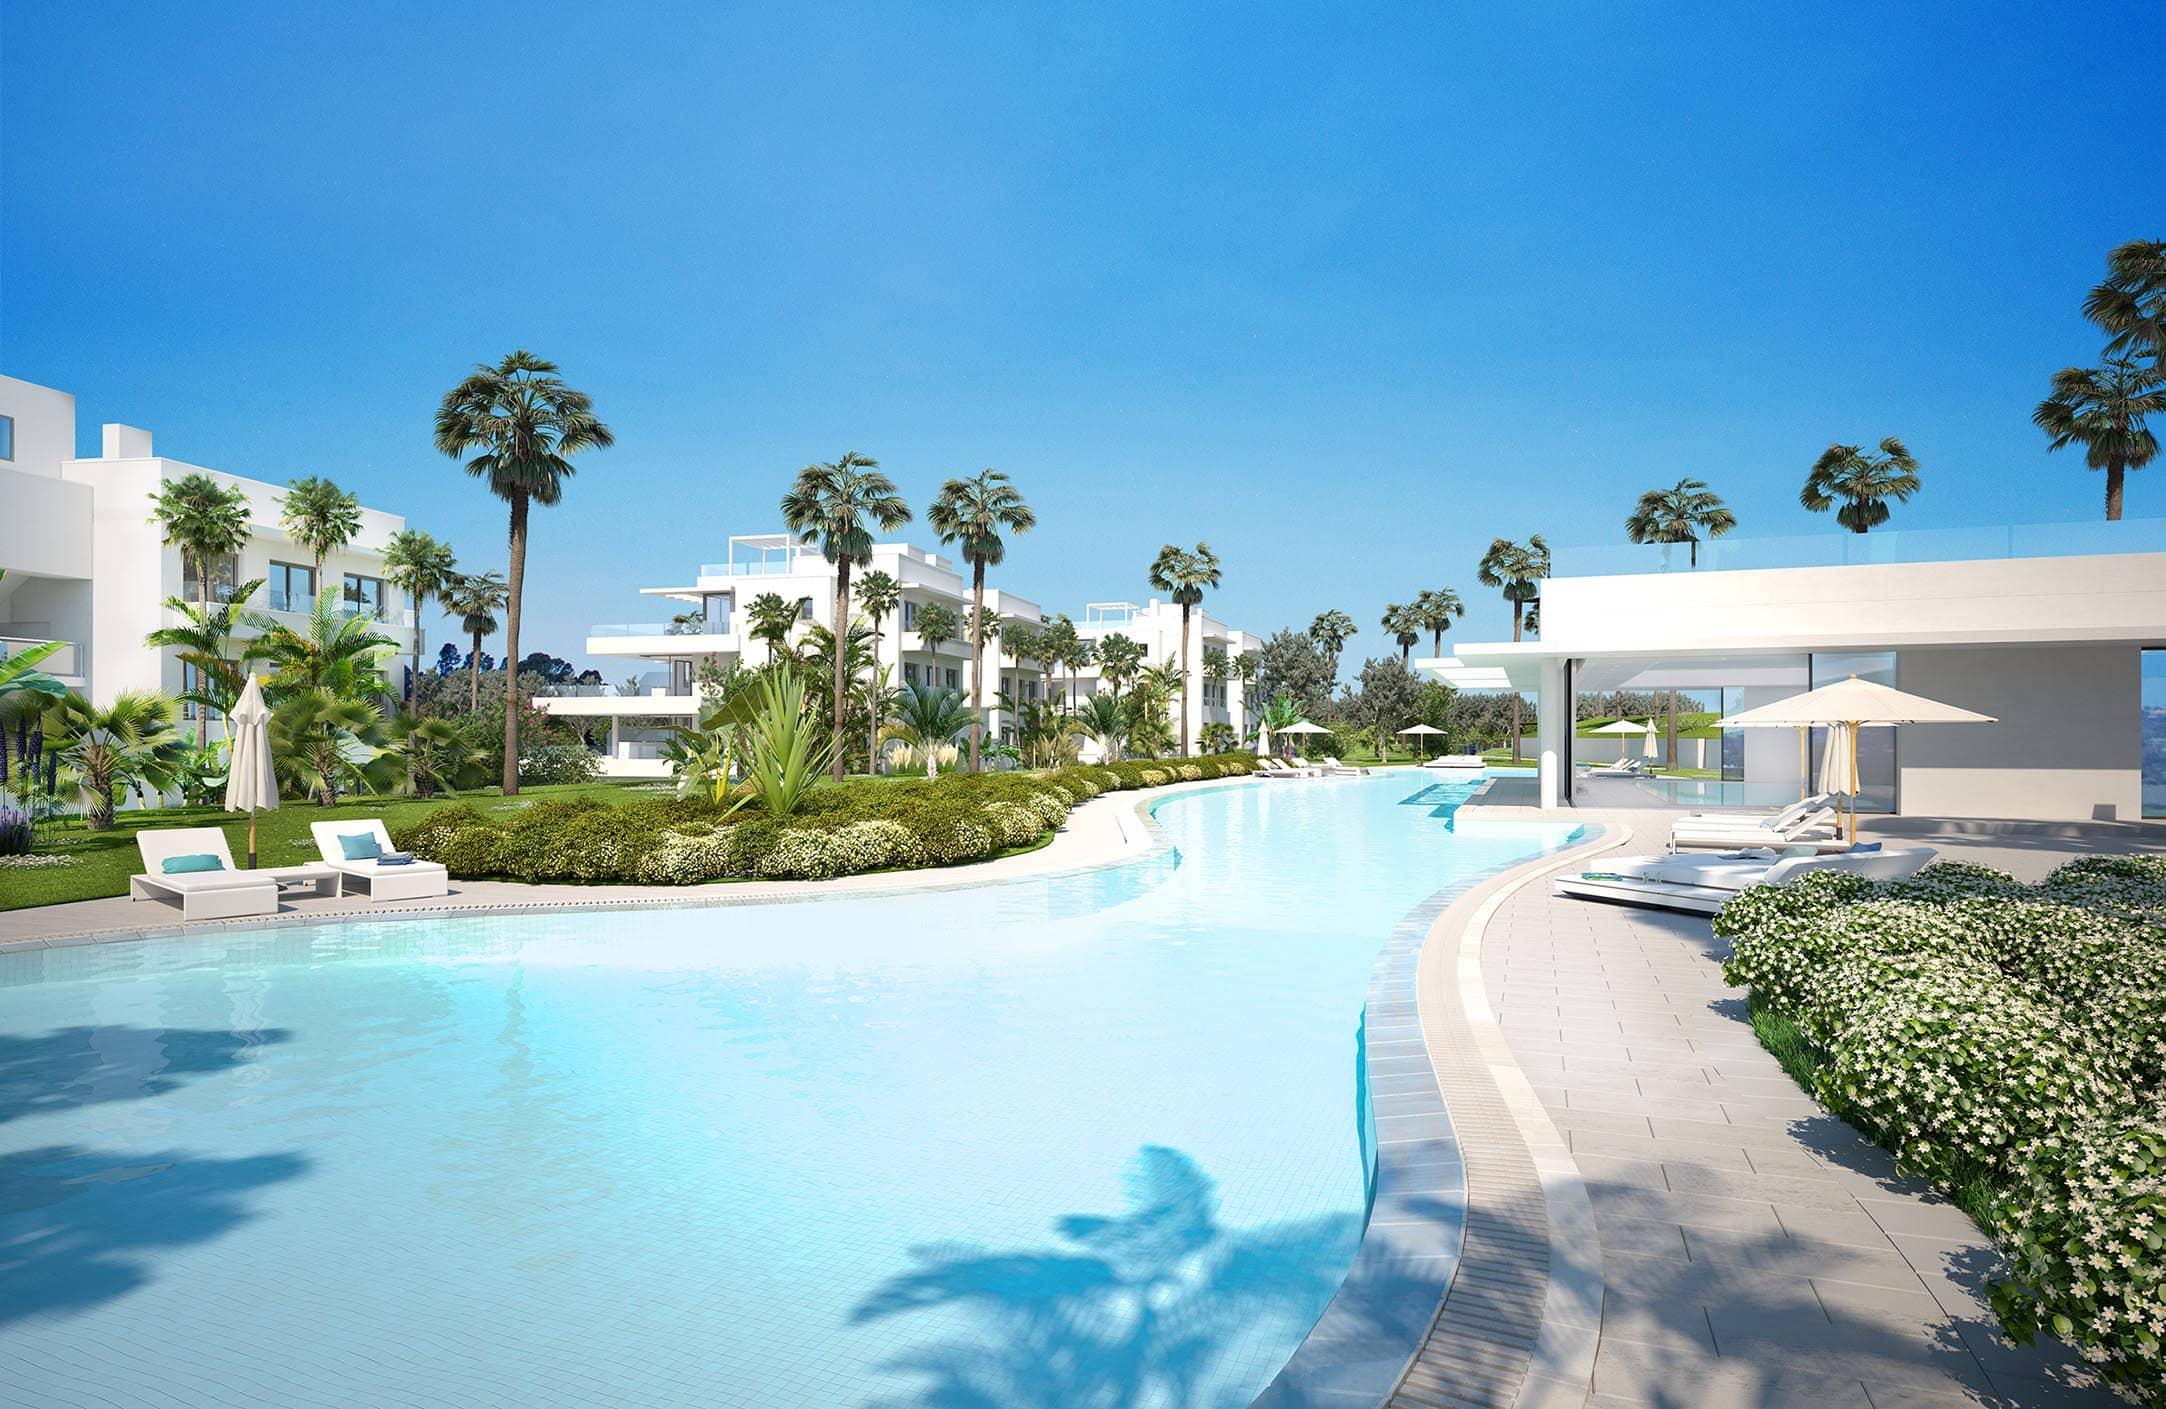 cataleya buitenzwembad